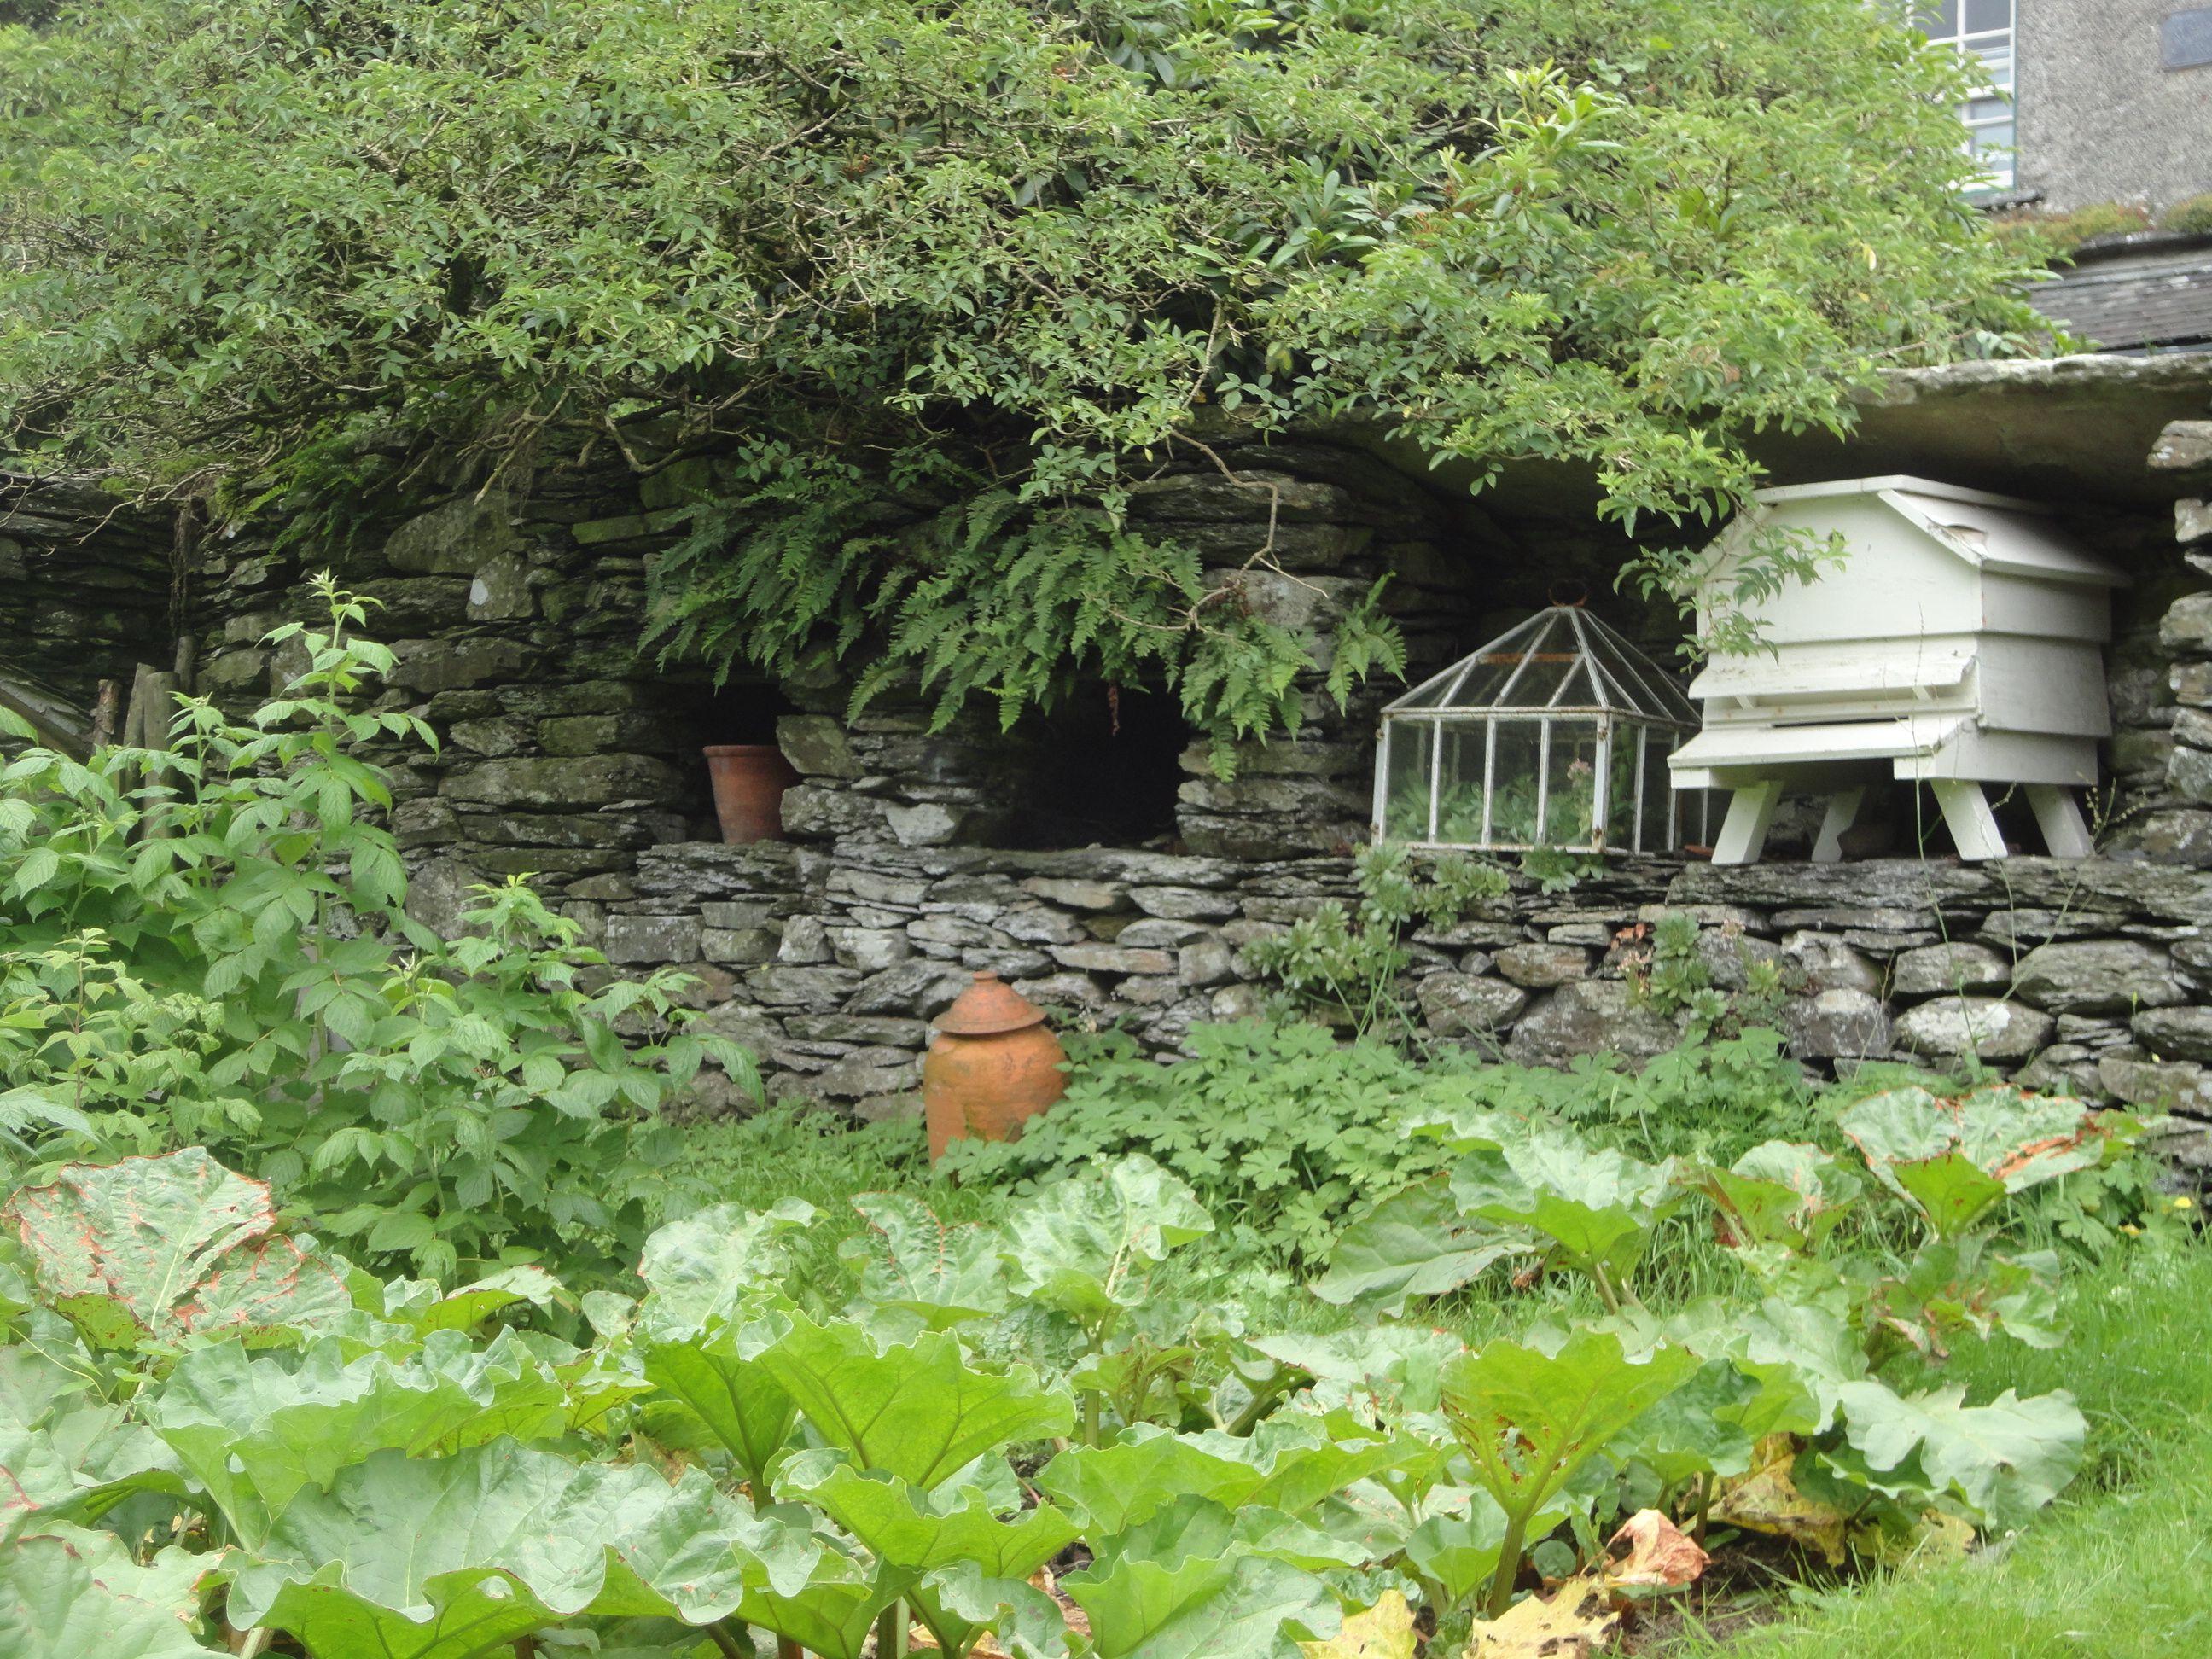 Beatrix Potter's garden at Hill Top Farm, Near Sawrey